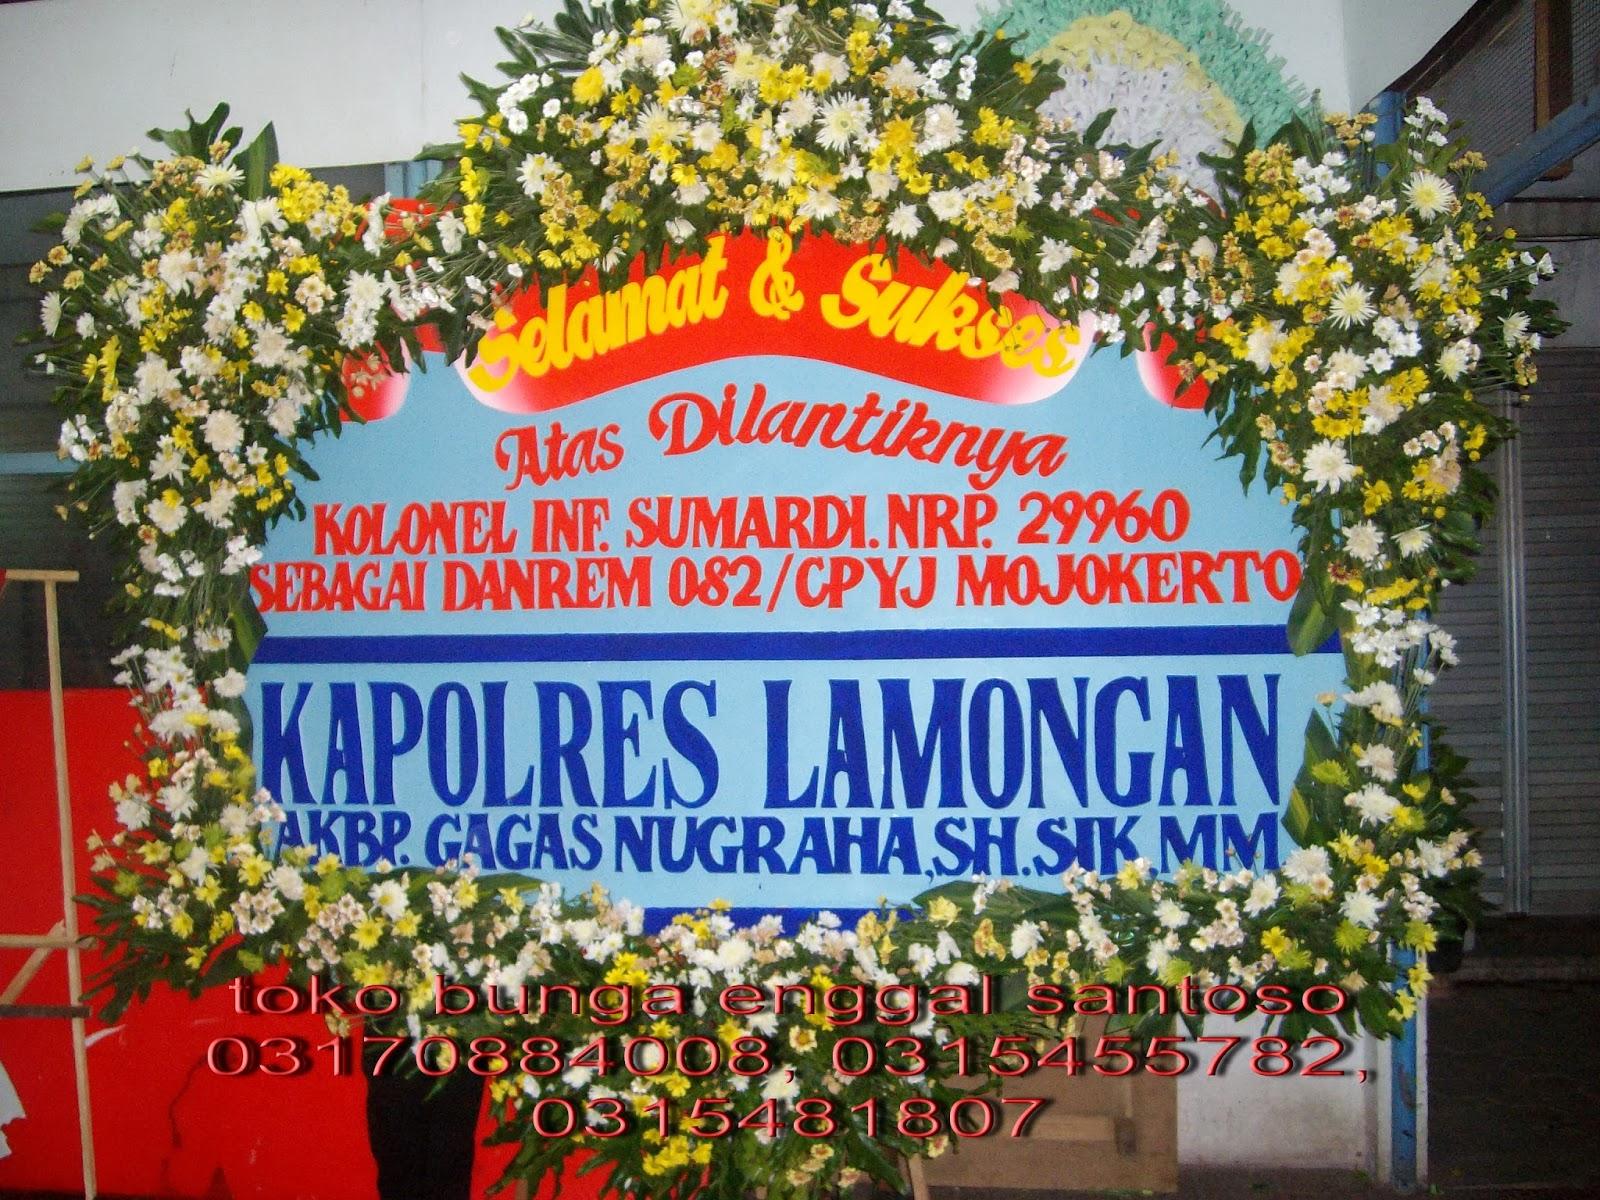 karangan bunga papan ucapan toko bunga gresik enggal santoso florist